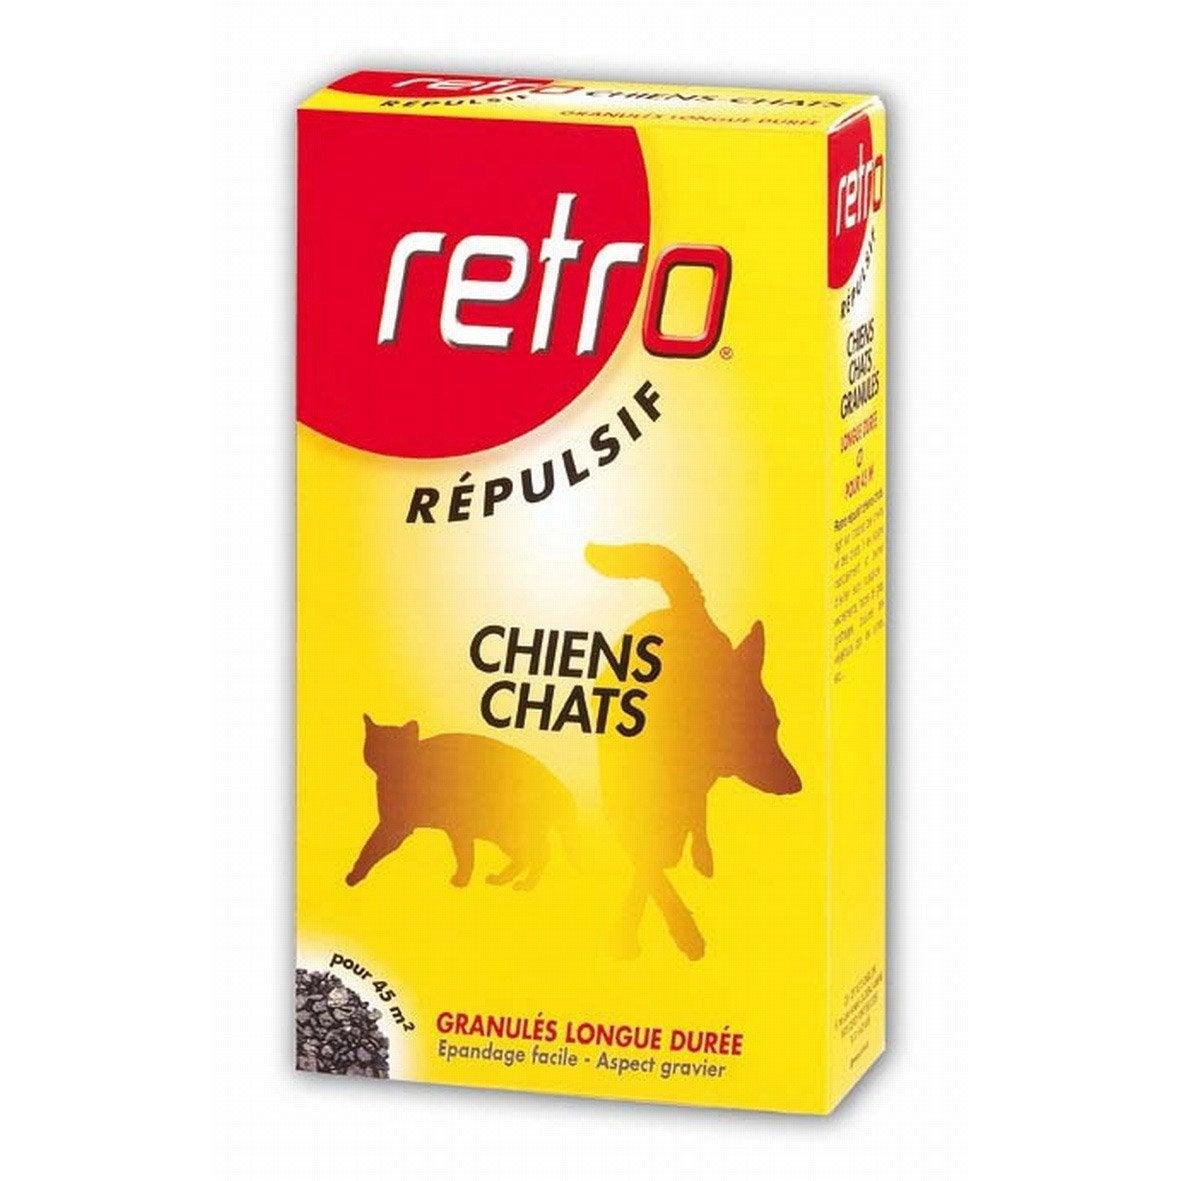 Repulsif Chat Leroy Merlin